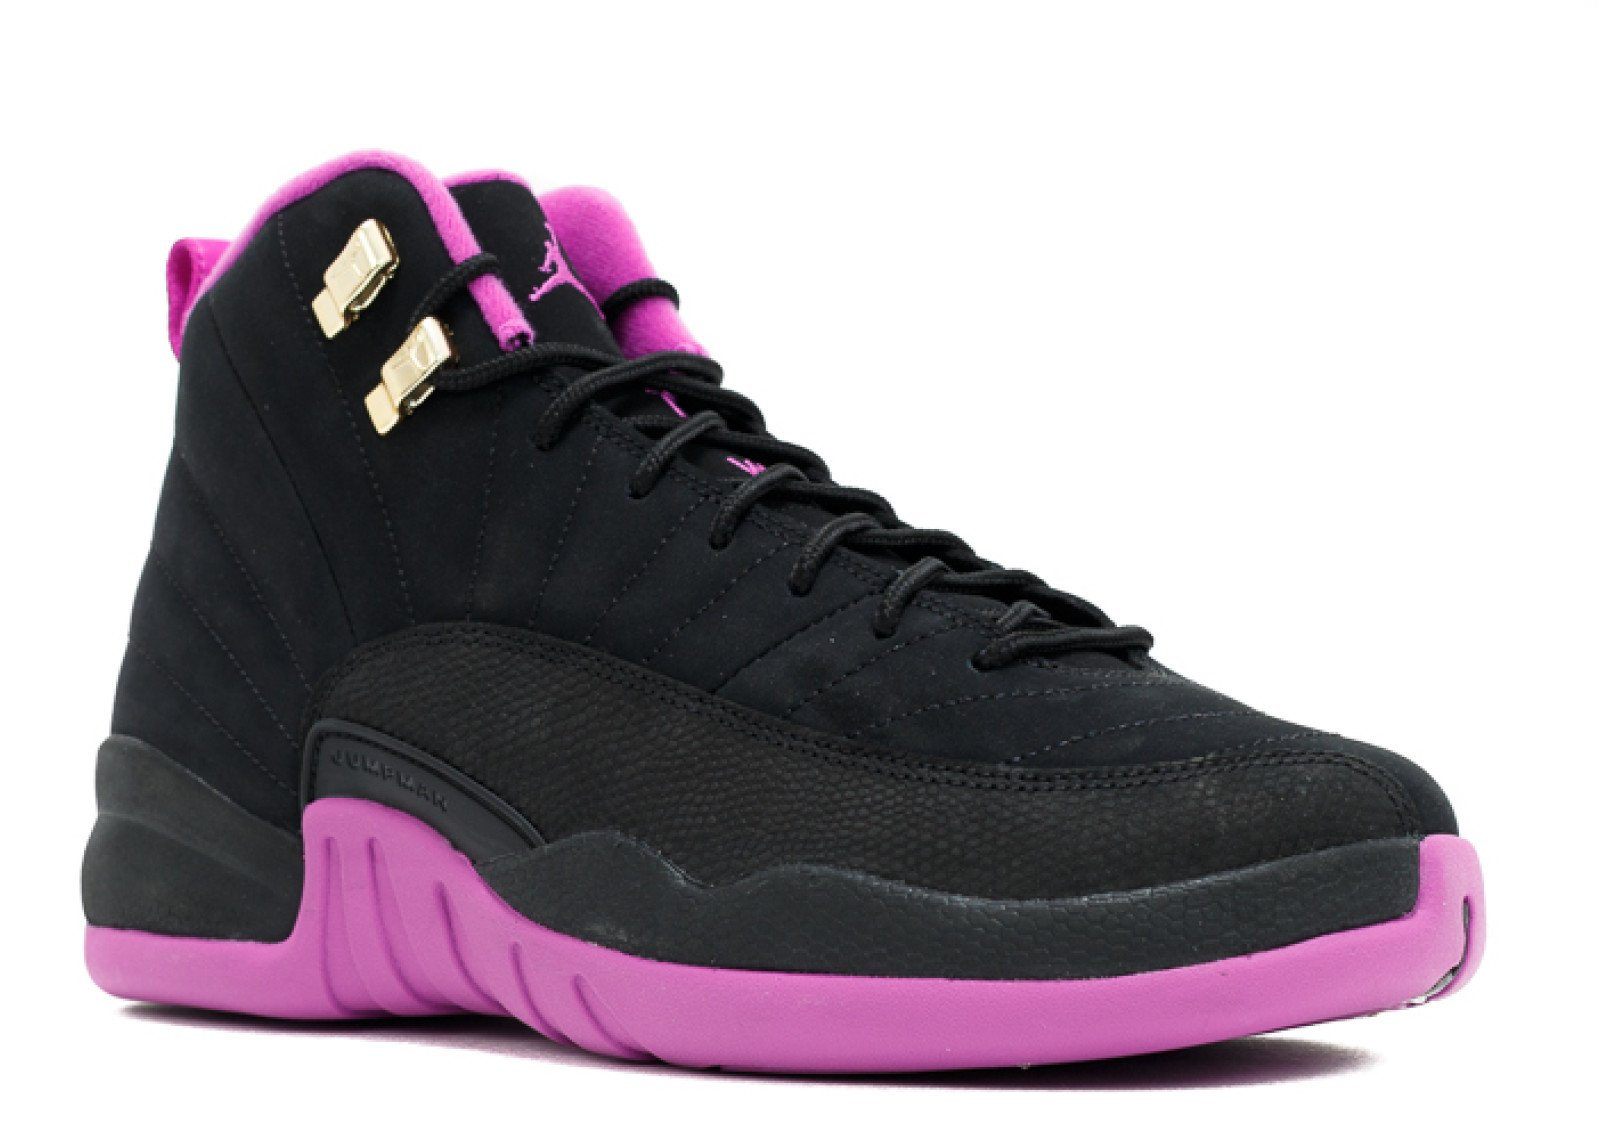 c33f2f53d1e canada amazon jordan air 12 retro gg big kids shoes black metallic gold  violet 510815 018